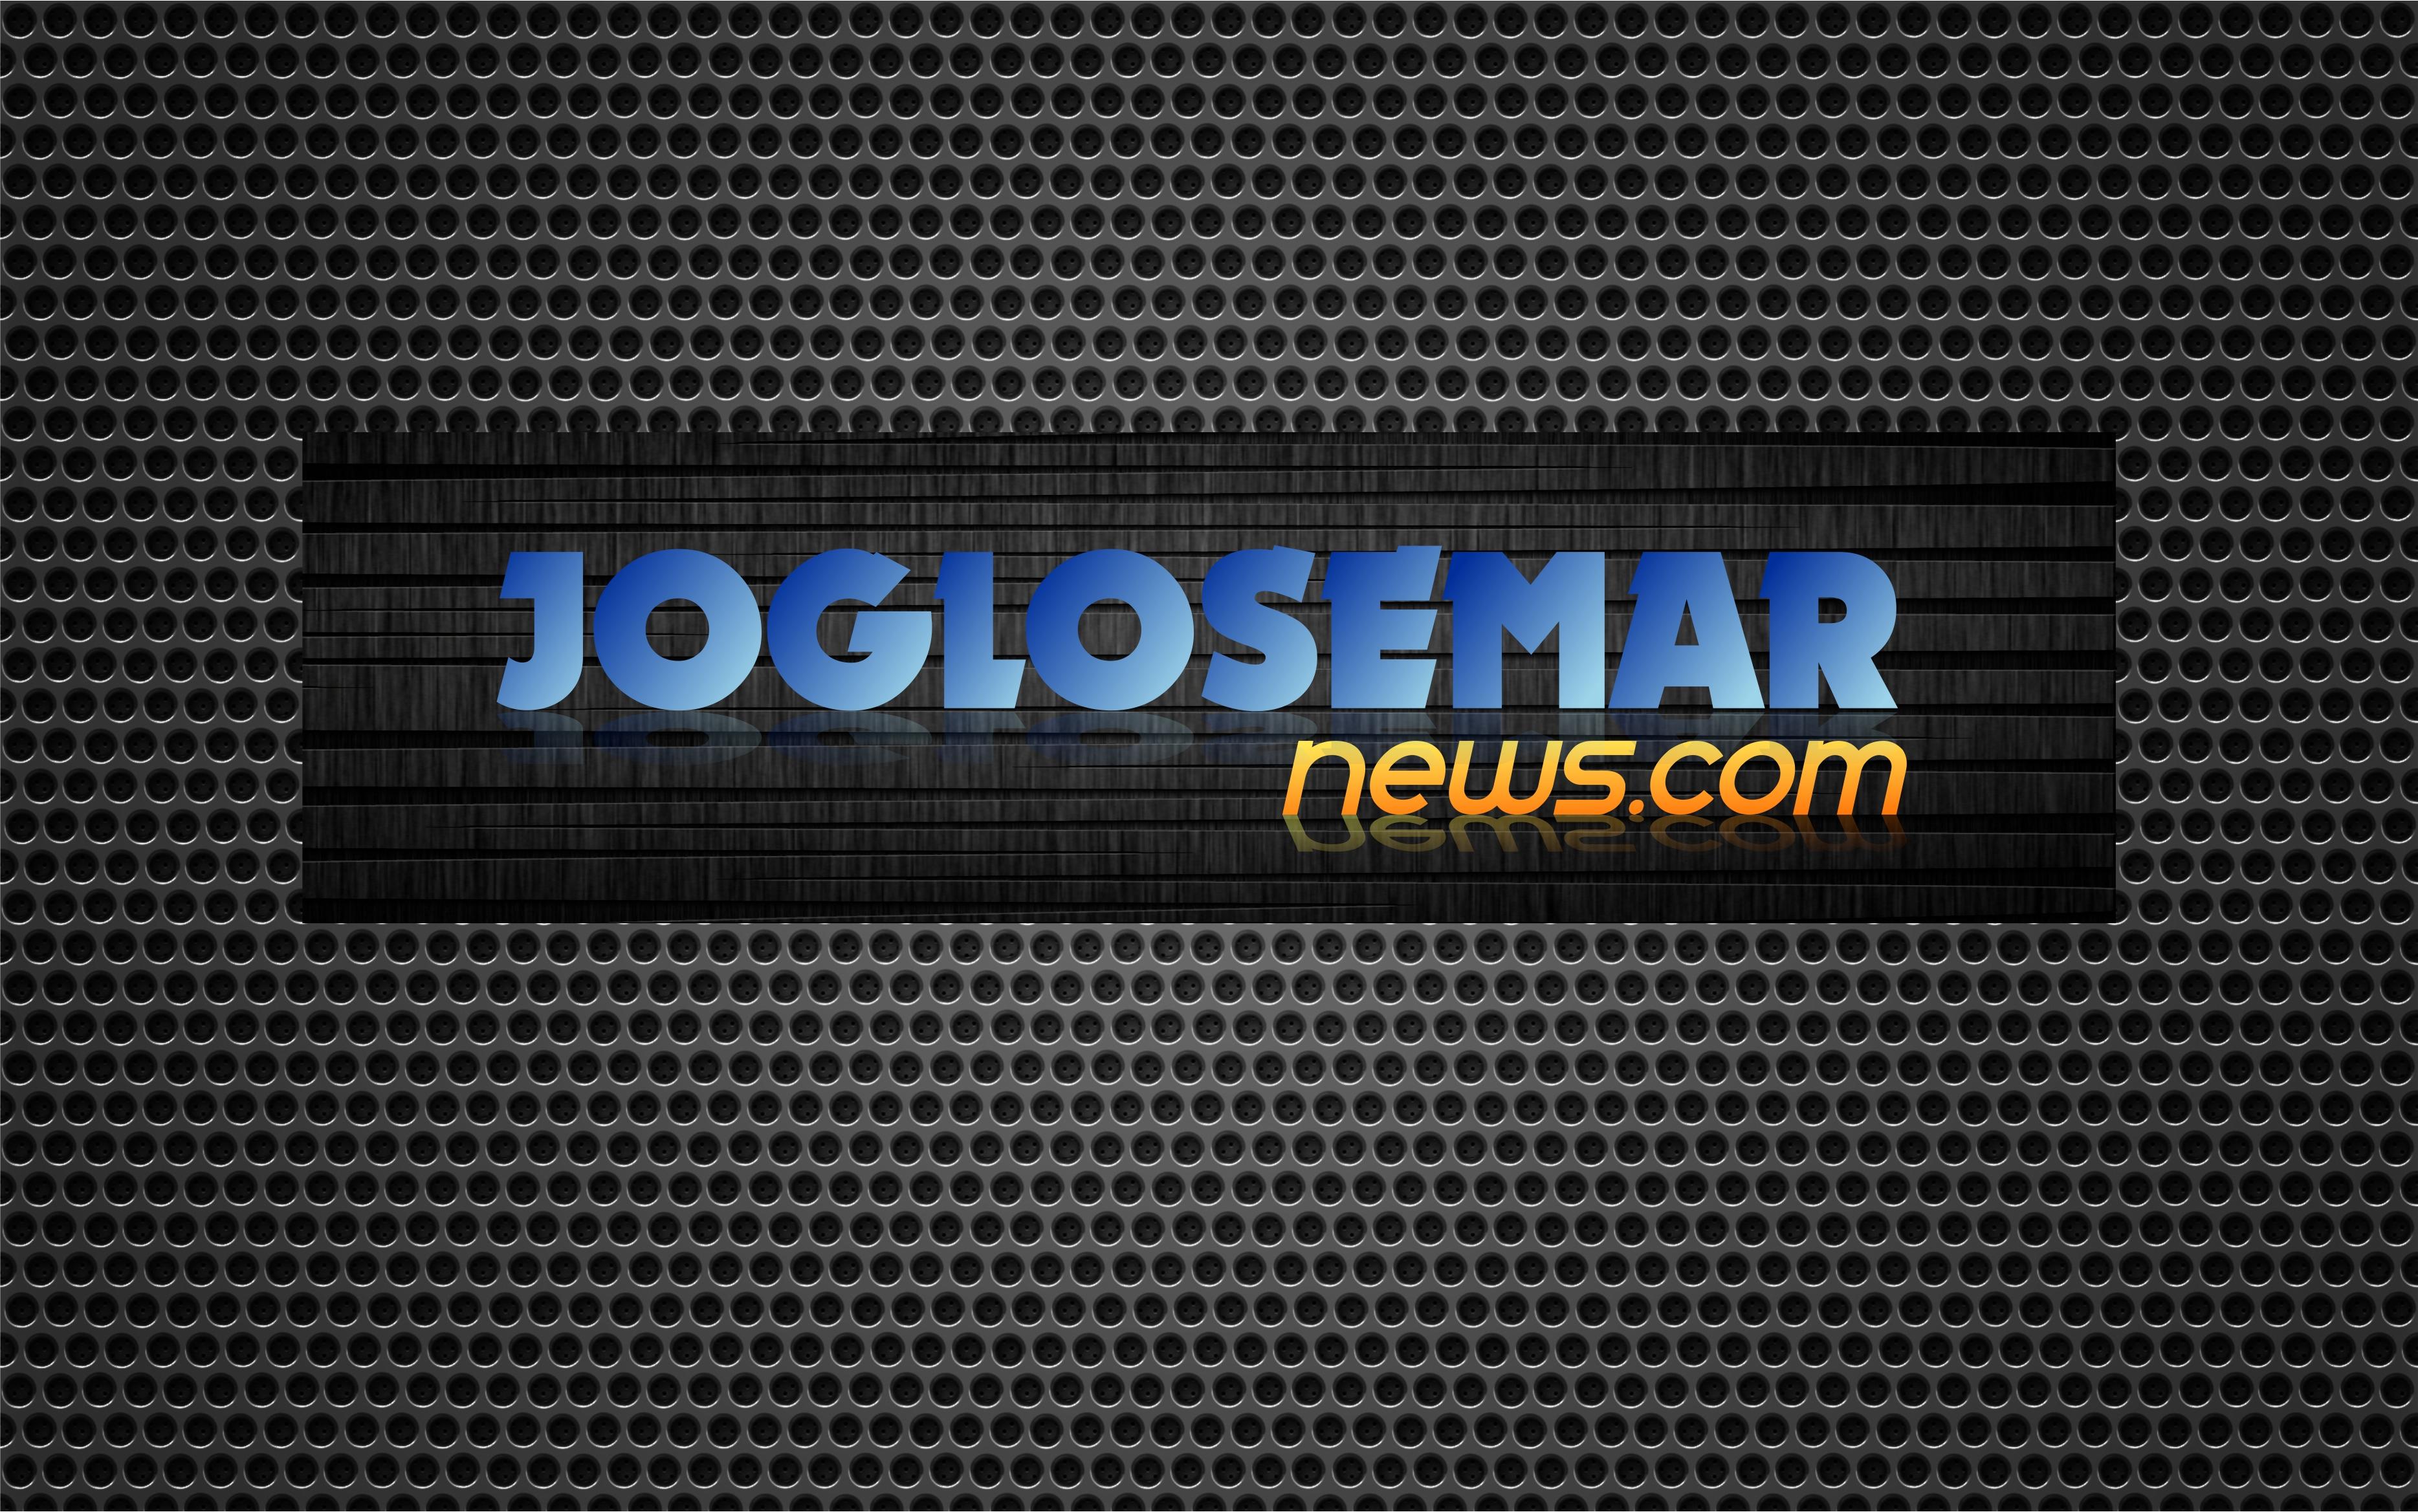 joglosemarnews com joglosemar news portal rh joglosemarnews com joglosemar travel solo hari ini berita joglosemar solo hari ini